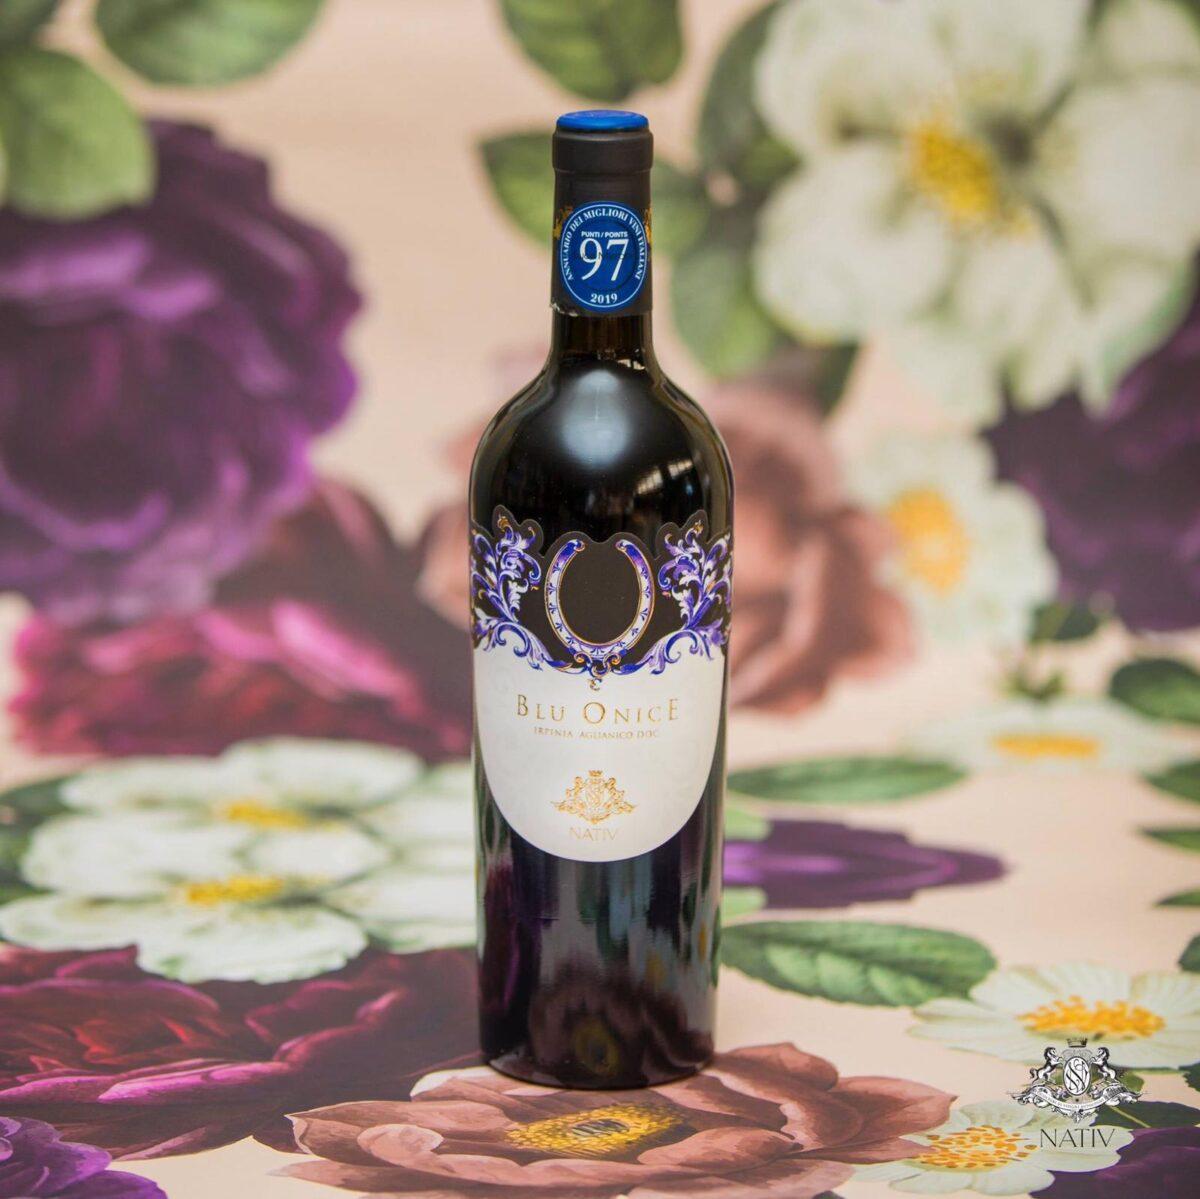 blu onice irpinia aglianico doc vino nativ